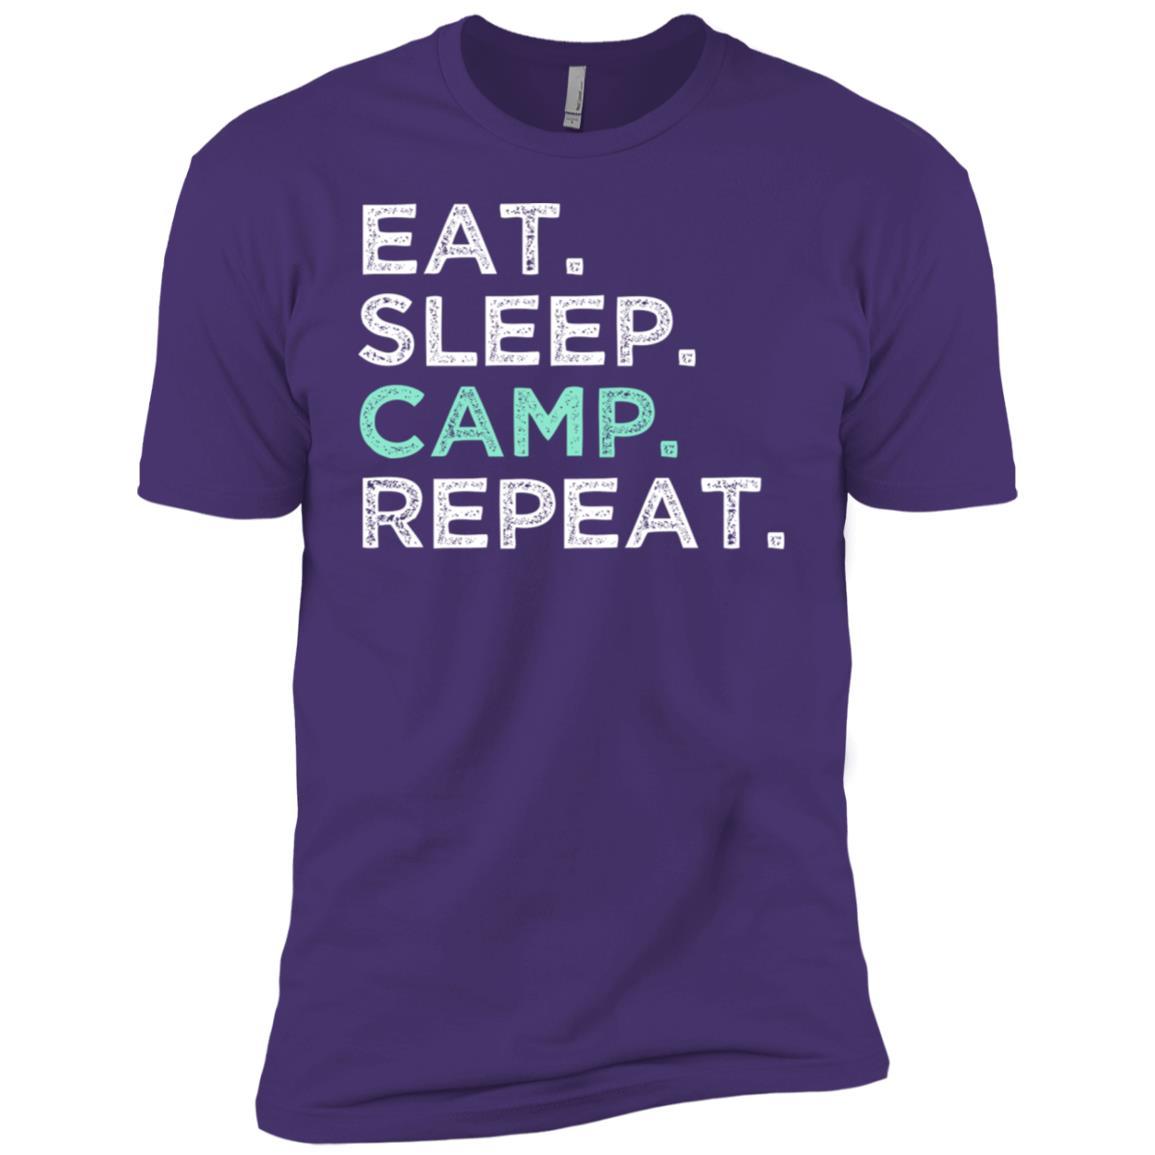 Eat Sleep Camp Repeat Premium. Camping Men Short Sleeve T-Shirt